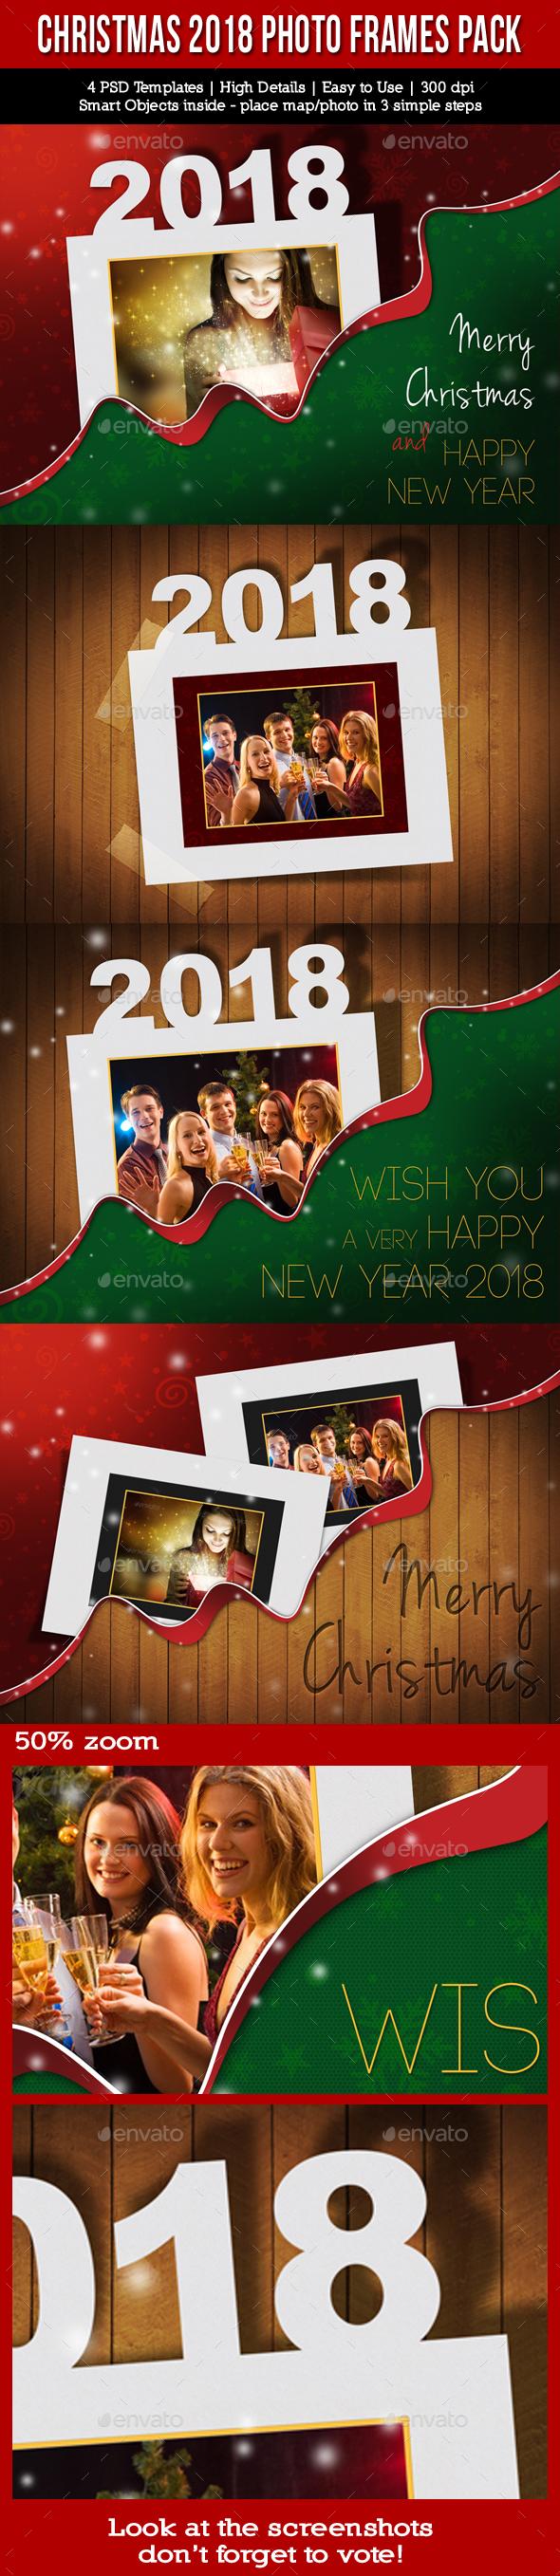 Christmas Holidays 2018 Photo Frames Pack - Seasonal Photo Templates